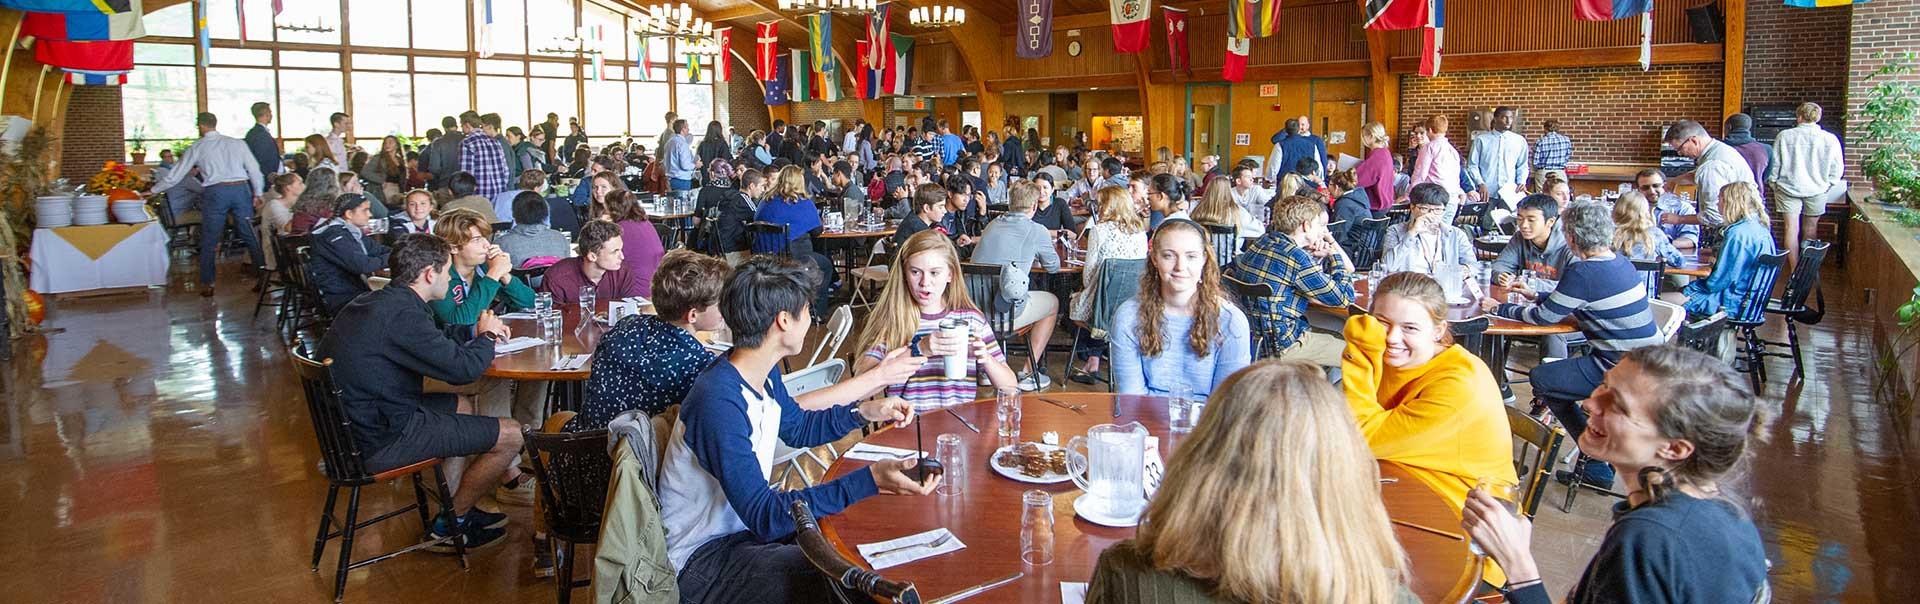 VermontAcademy-Lunchroom-SELECT-Banner-2020